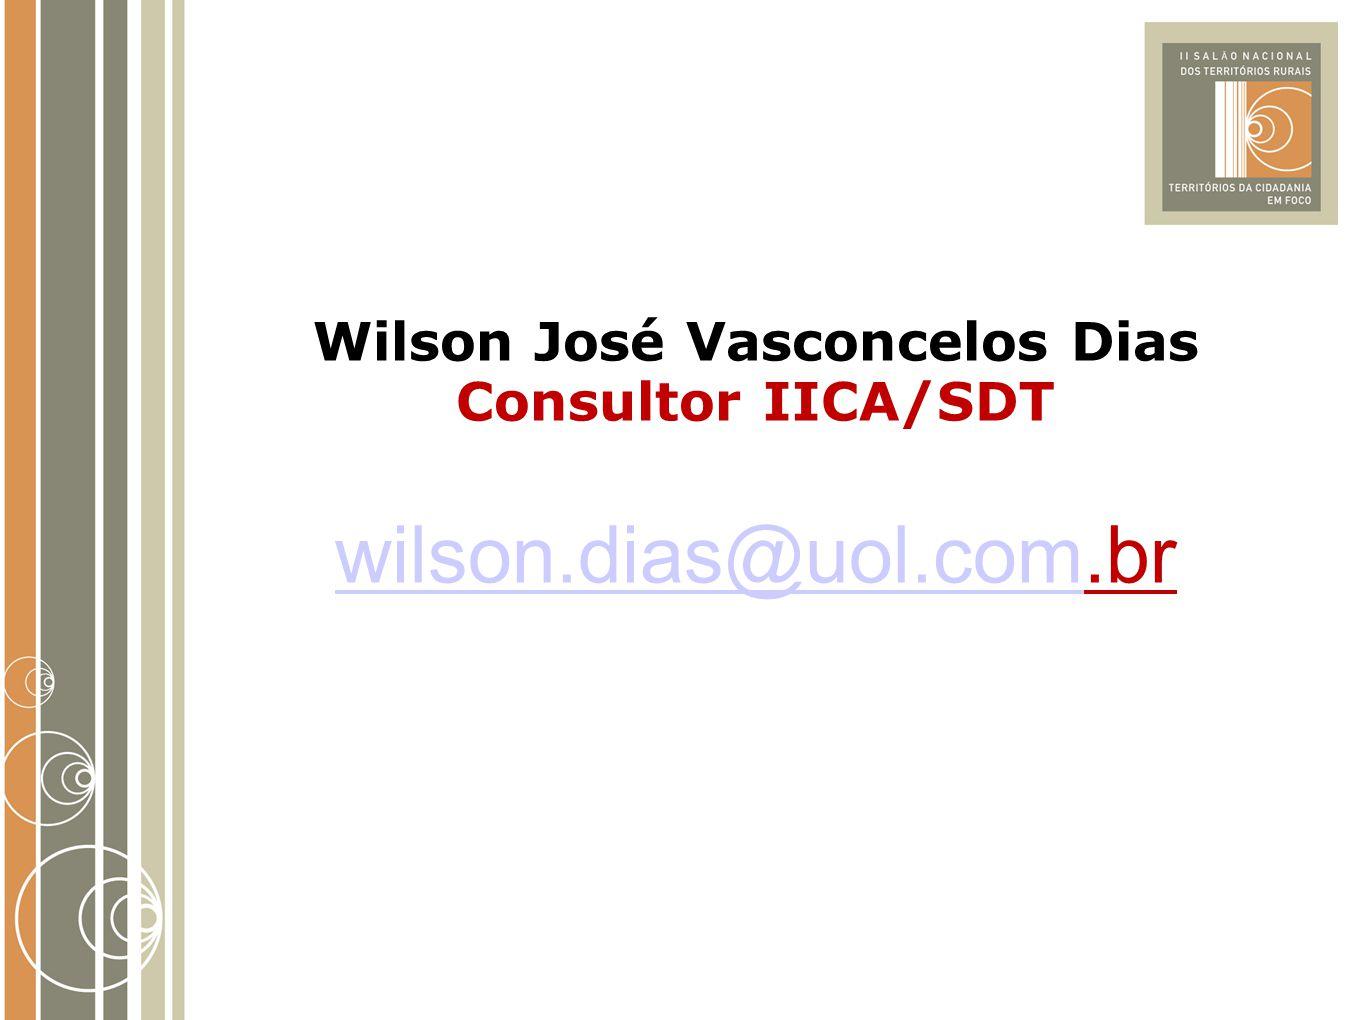 Wilson José Vasconcelos Dias